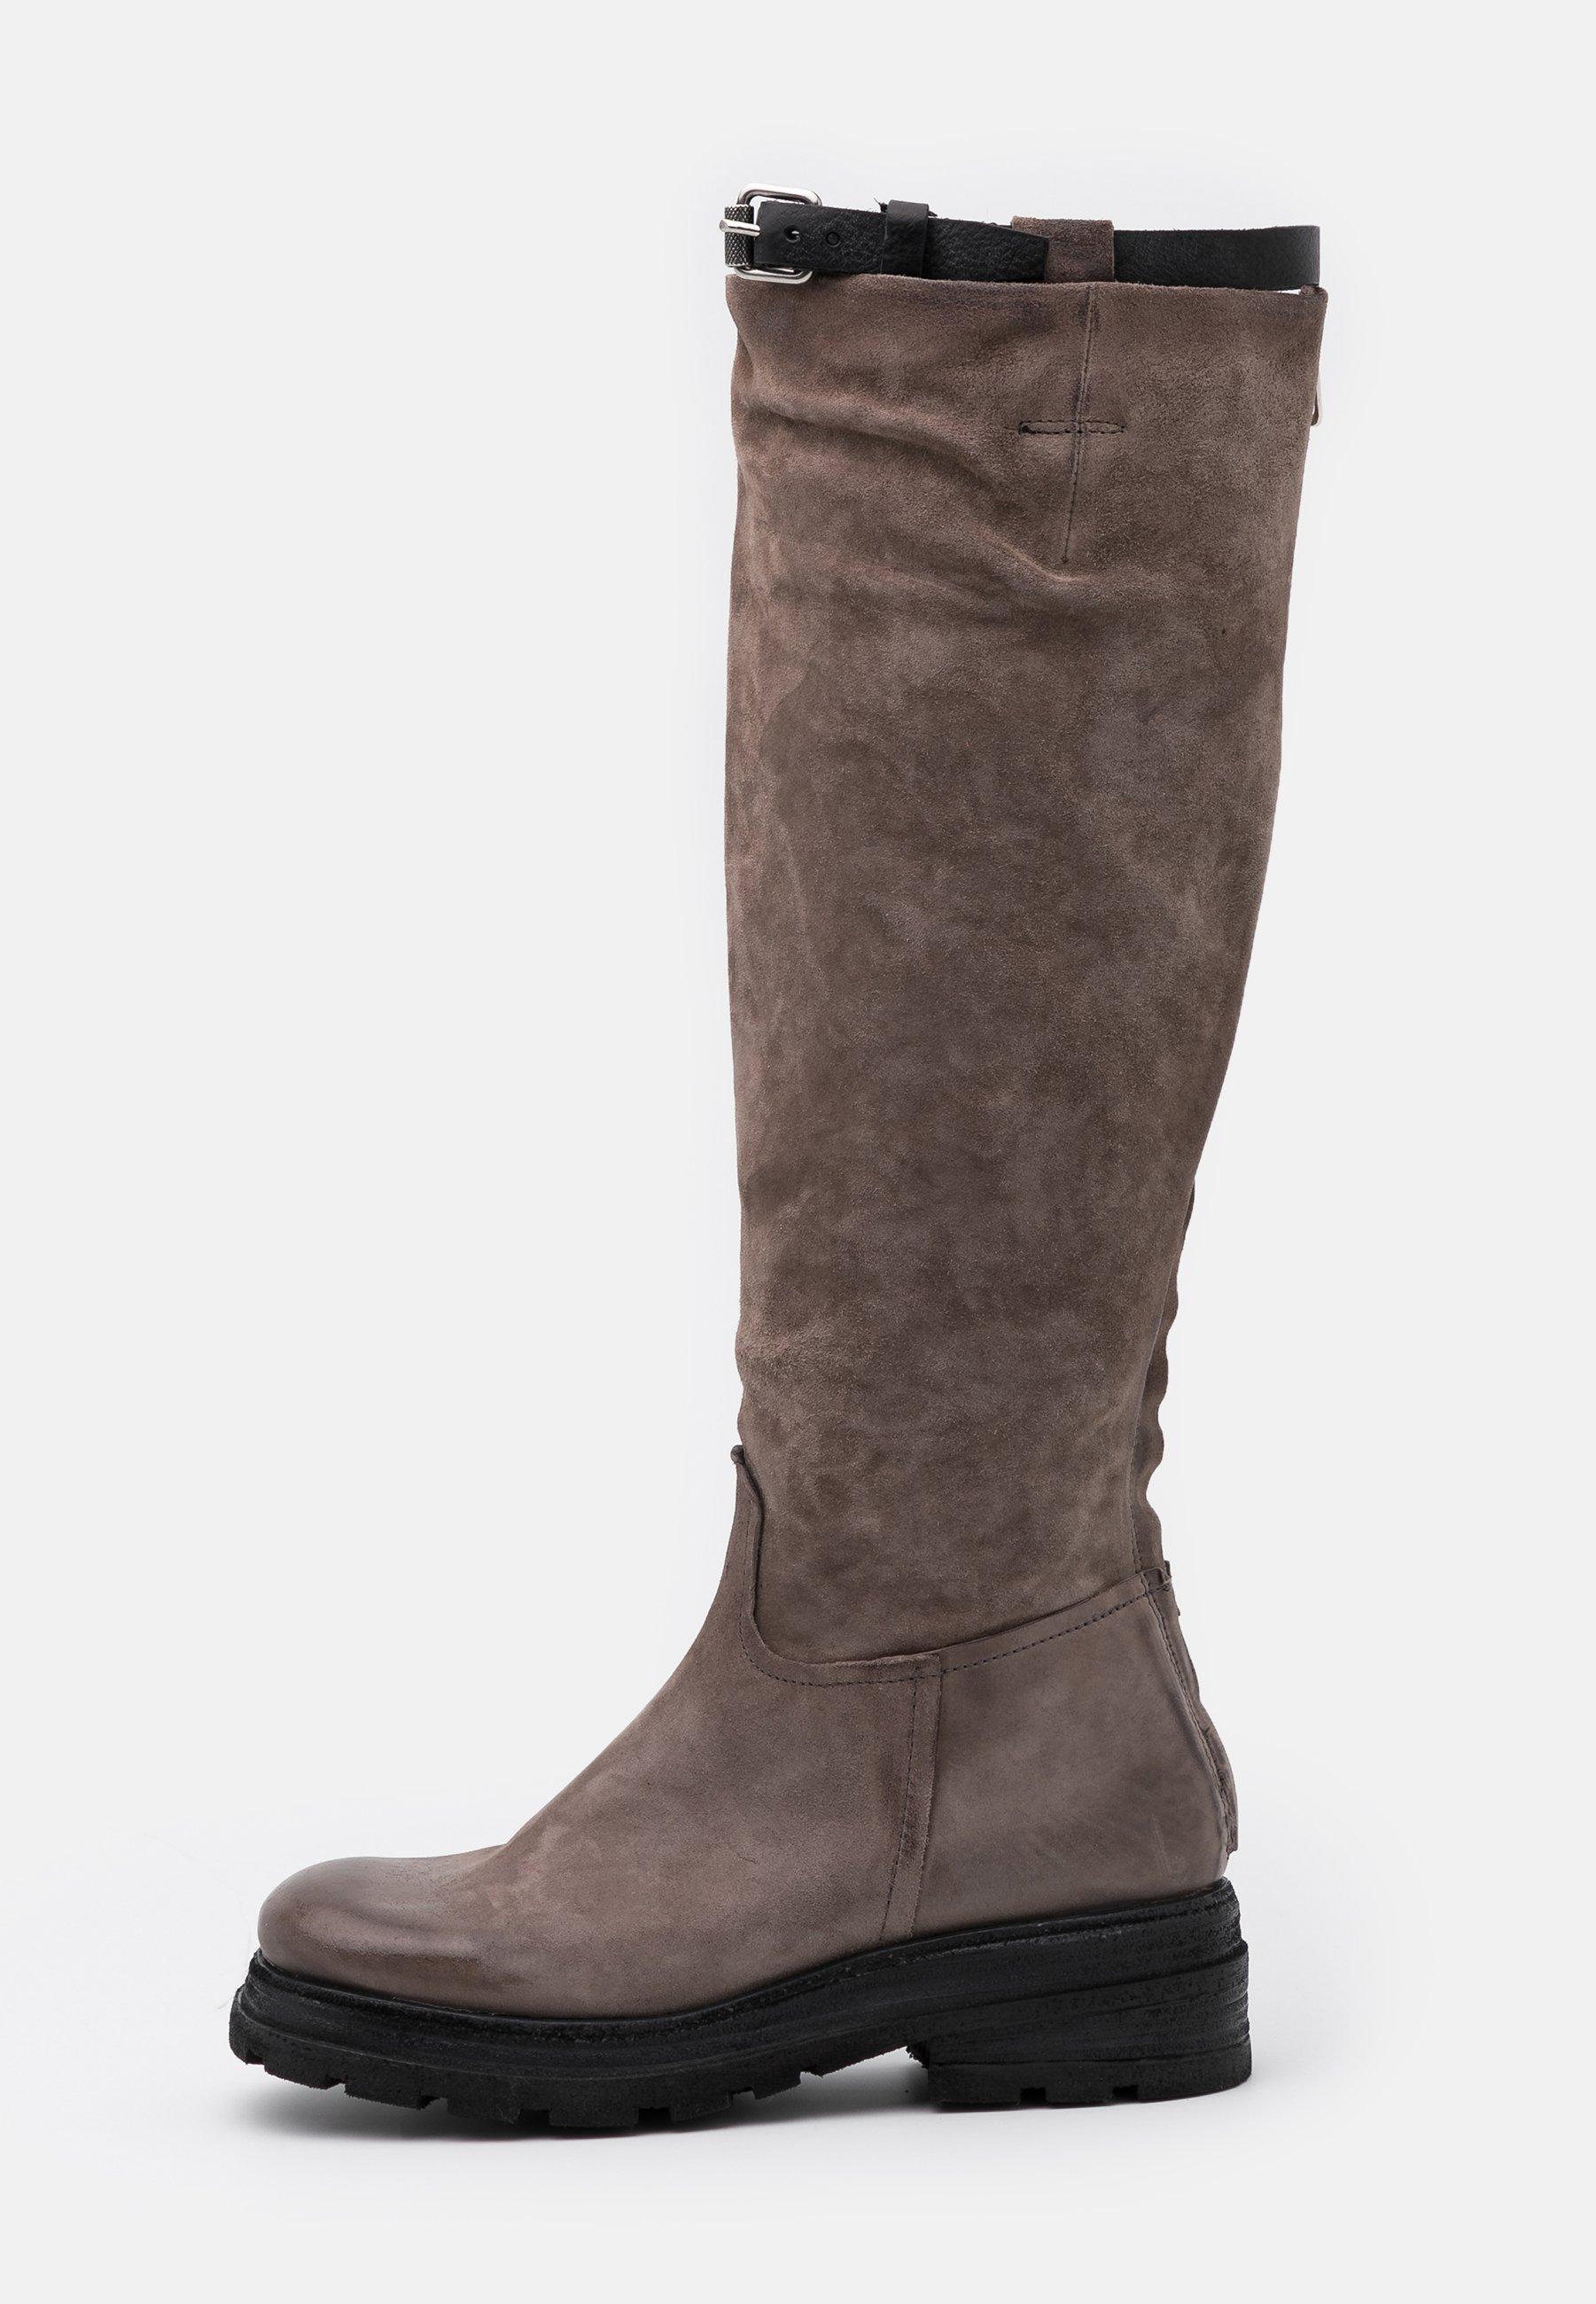 A.S.98 Skor online. Köp dina skor på ZALANDO.se